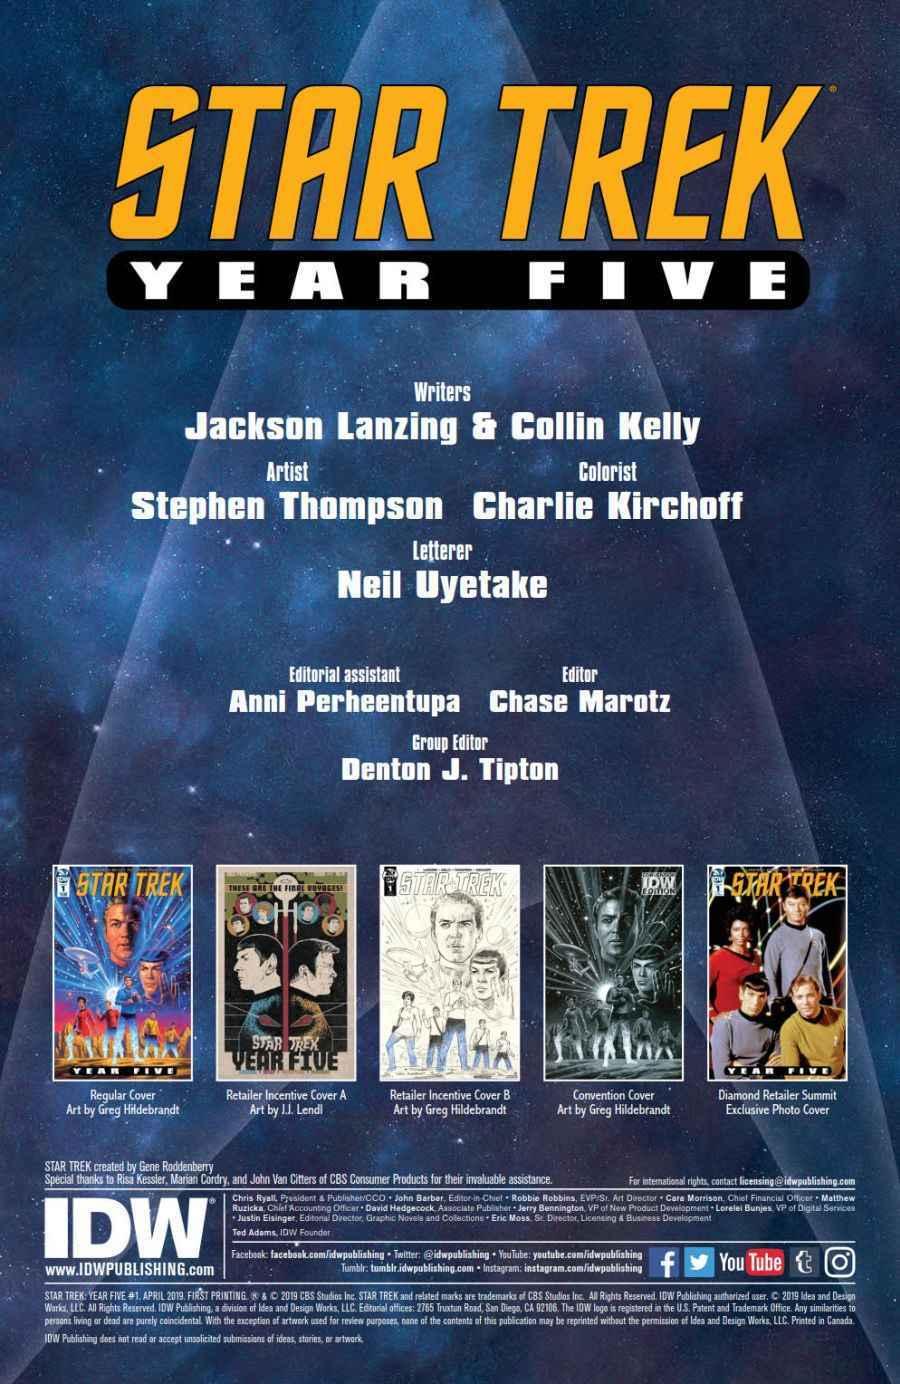 Star_Trek_Year_Five-01-pr (1)_2